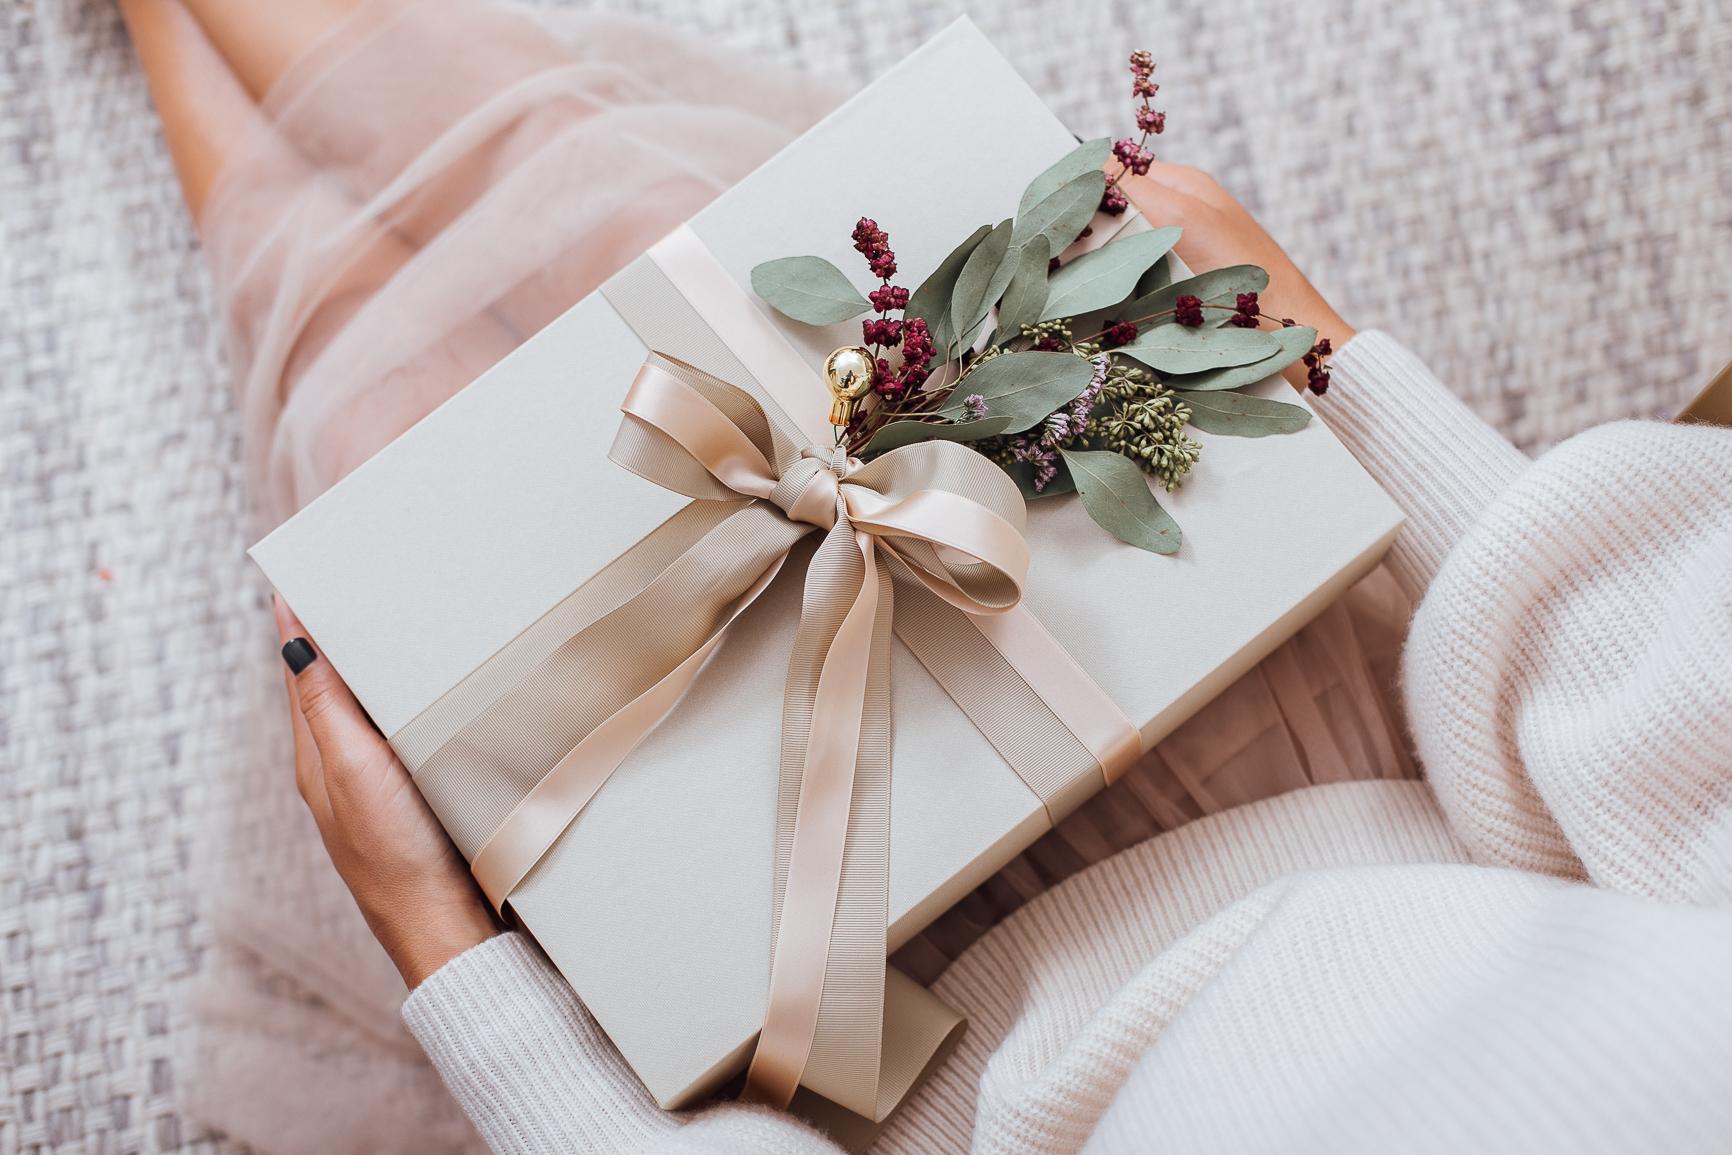 Weihnachtsgeschenke Beauty 2018